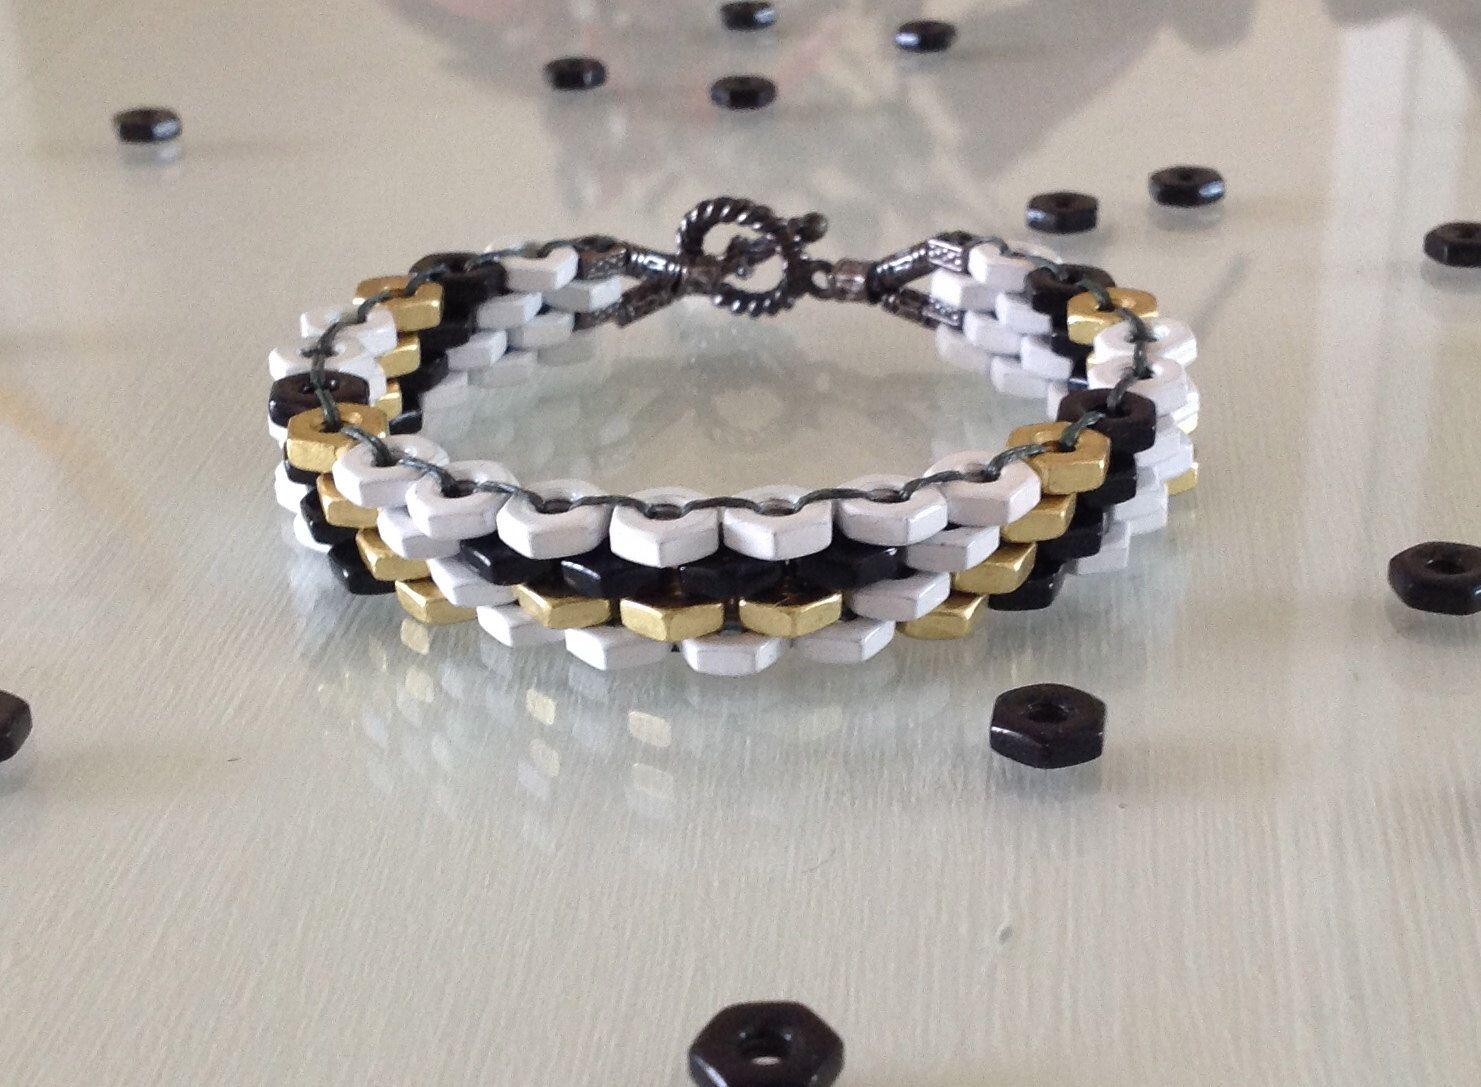 White Brass and Black Hex Nut Bracelet by BeautifulLanyards on Etsy https://www.etsy.com/listing/165988775/white-brass-and-black-hex-nut-bracelet